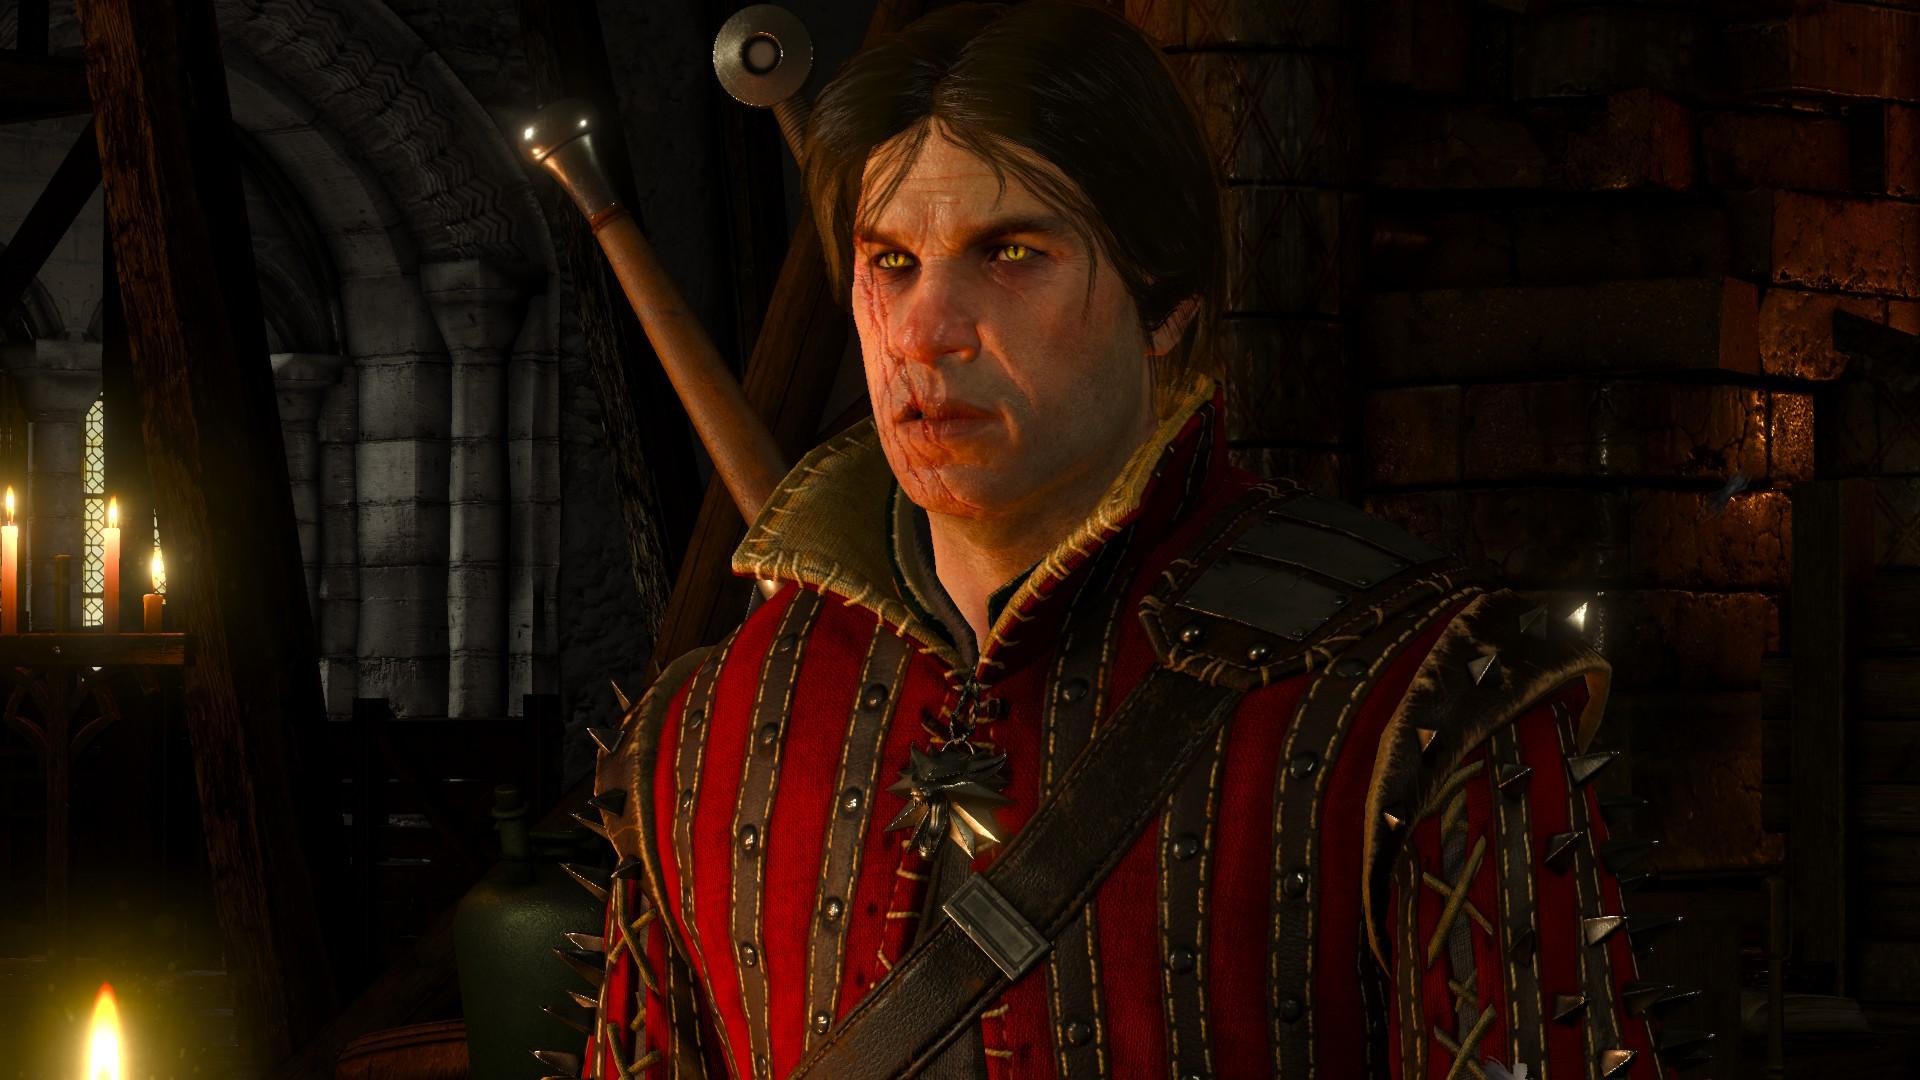 Es - Witcher 3: Wild Hunt, the